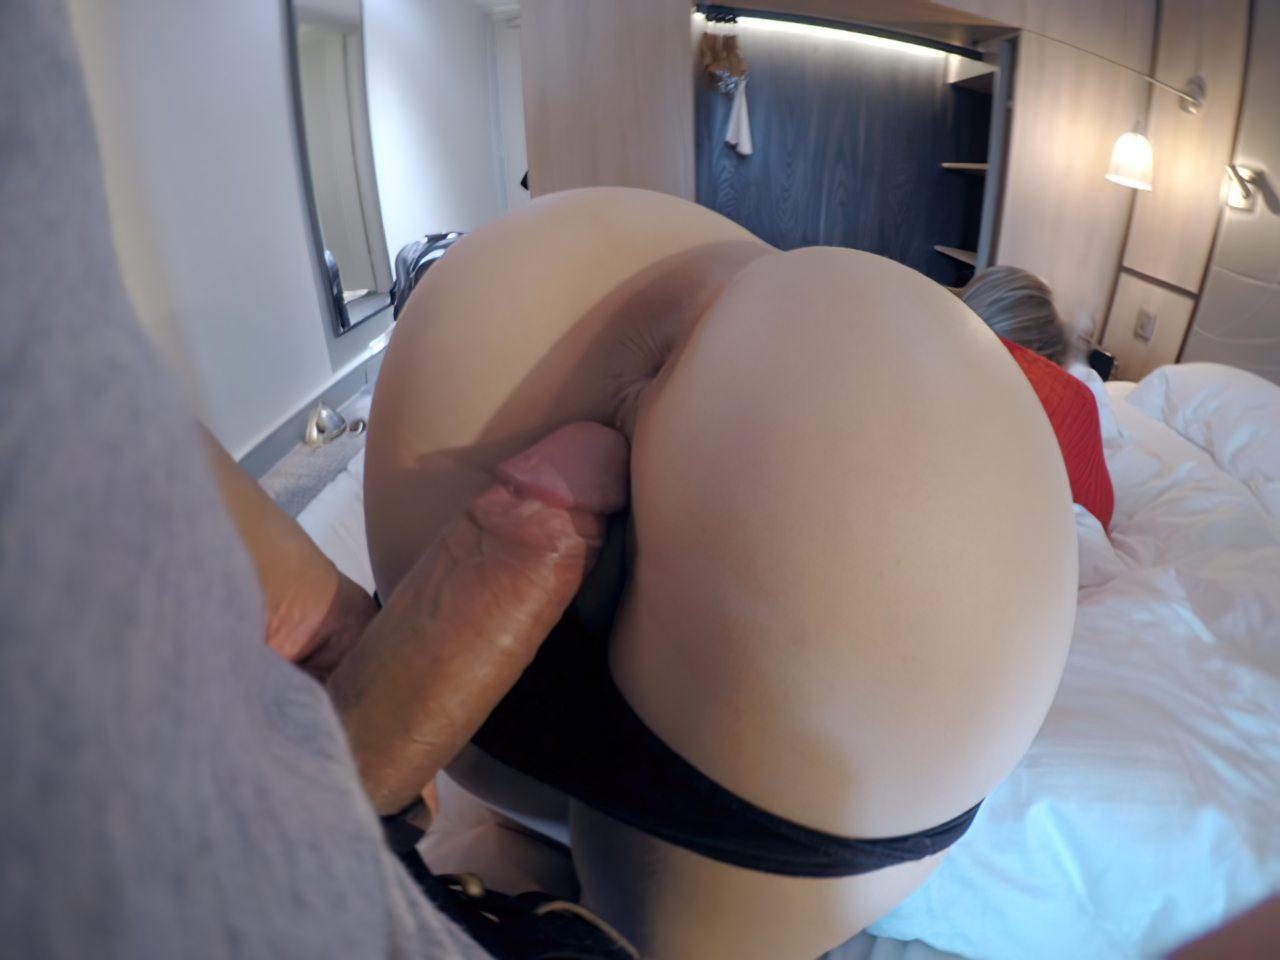 Sexo Anal Amadora Loirinha (21)